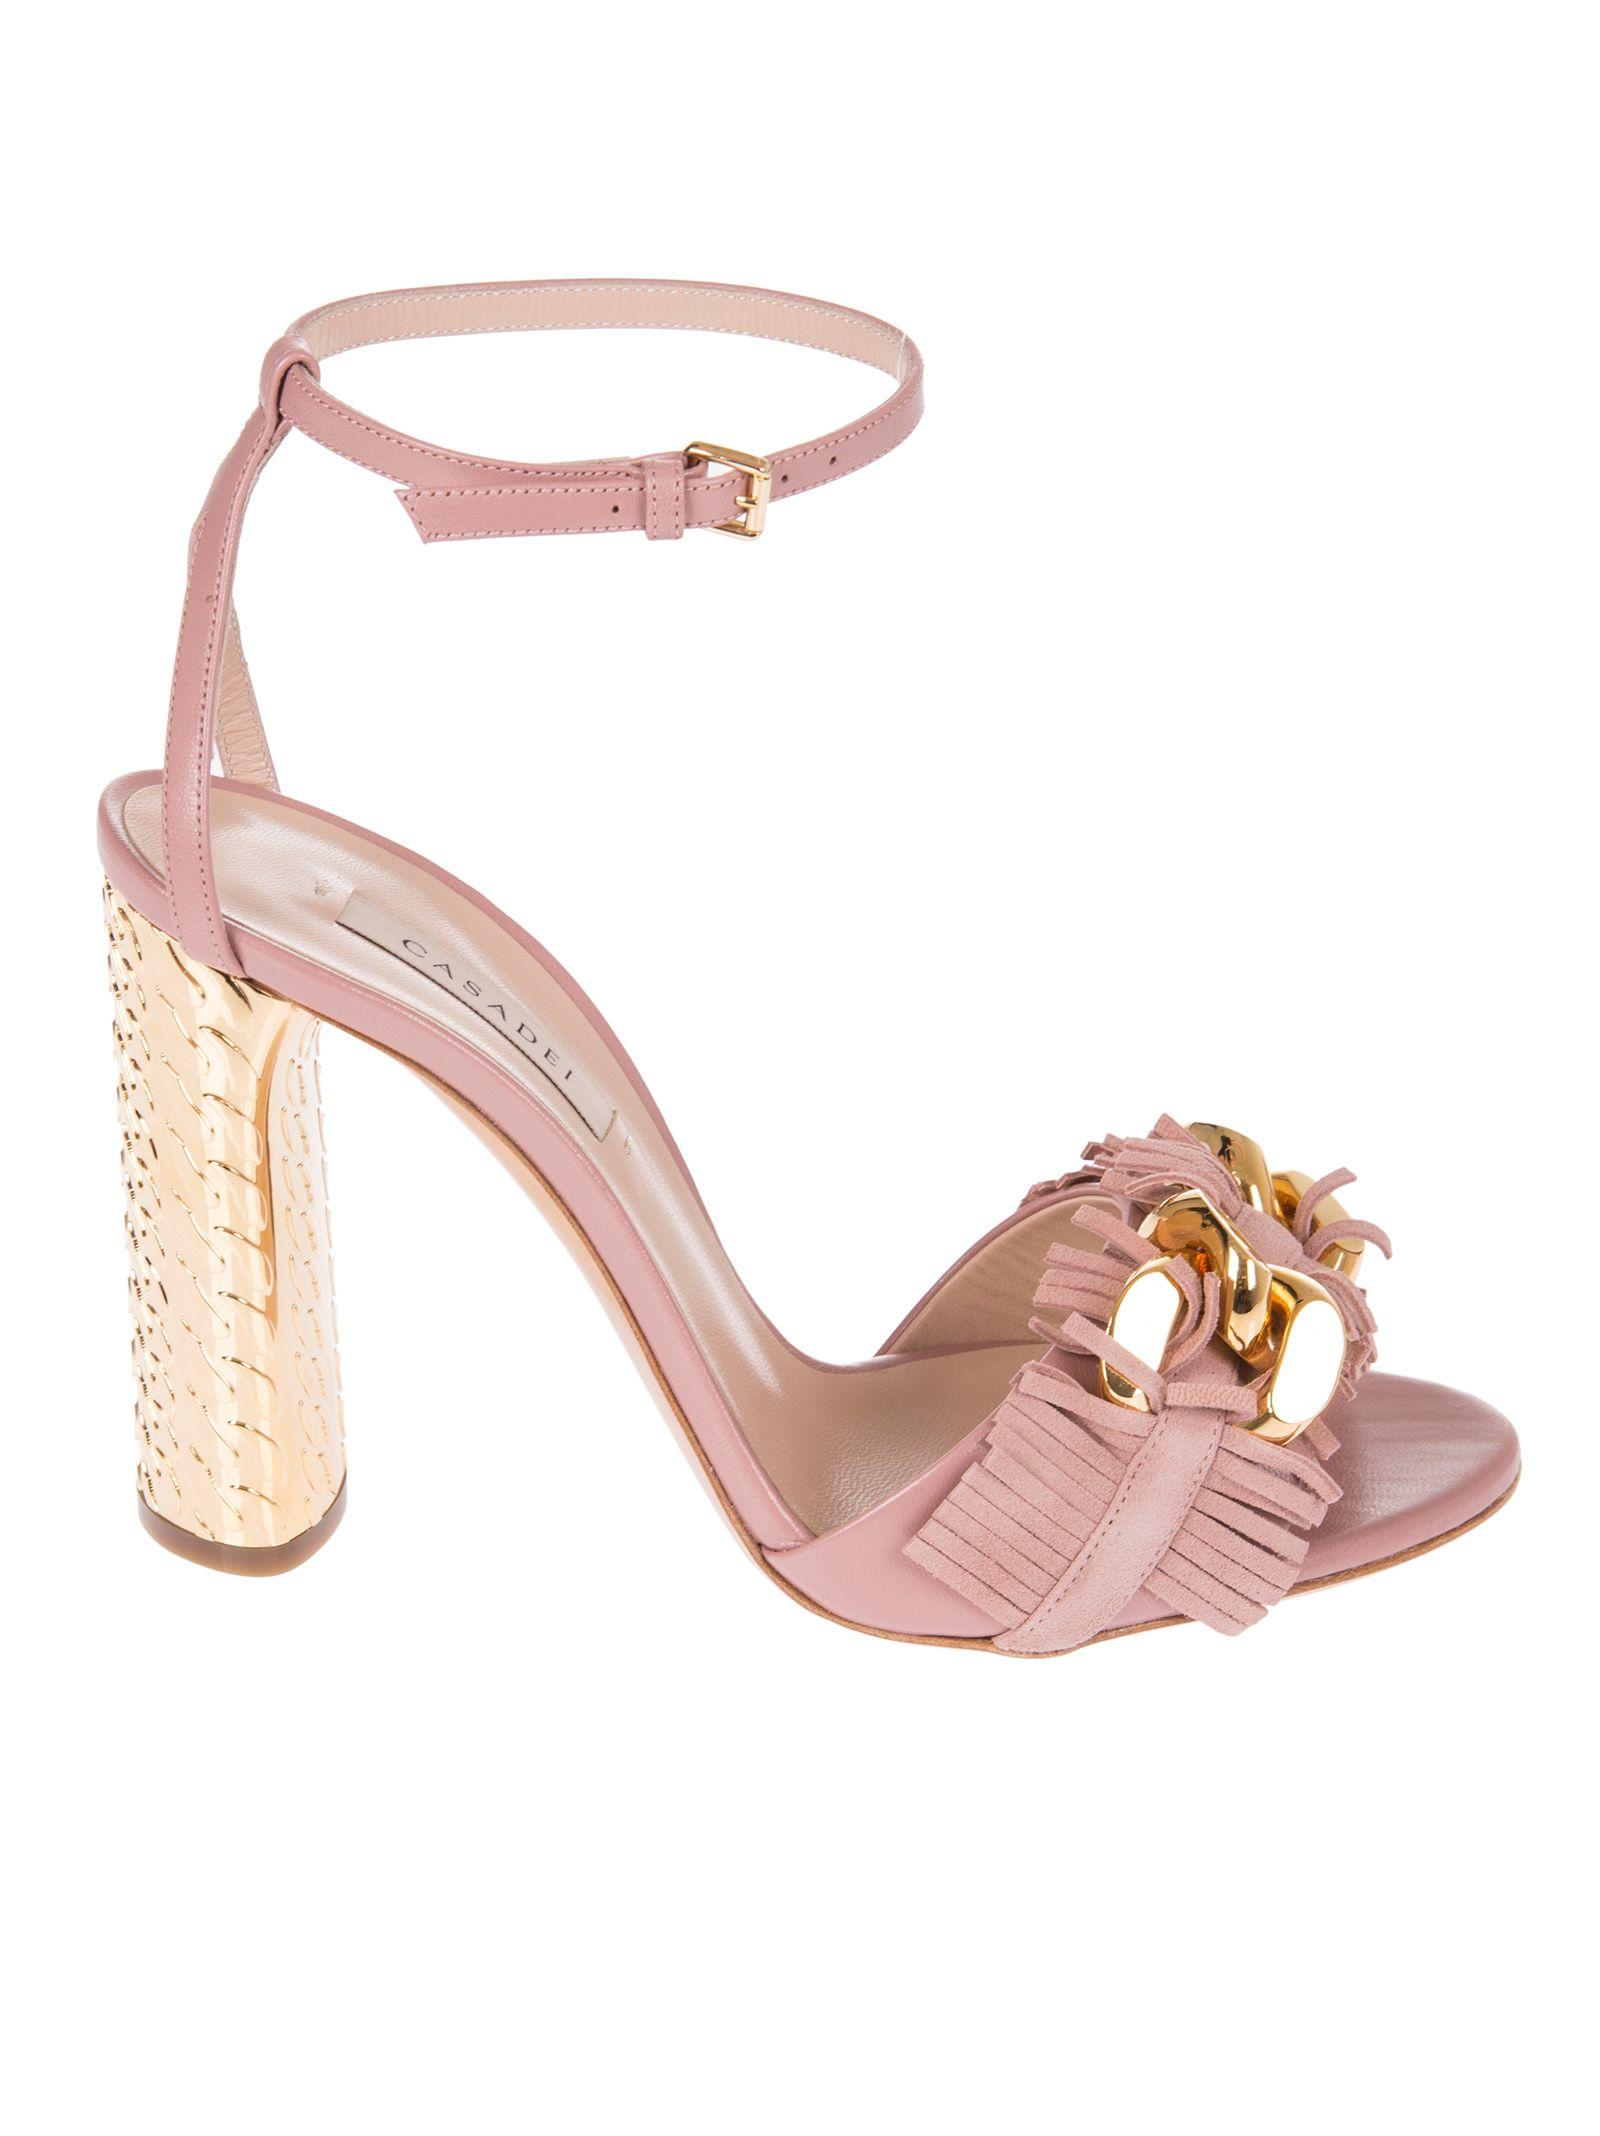 Casadei Frayed Block Heel Sandals